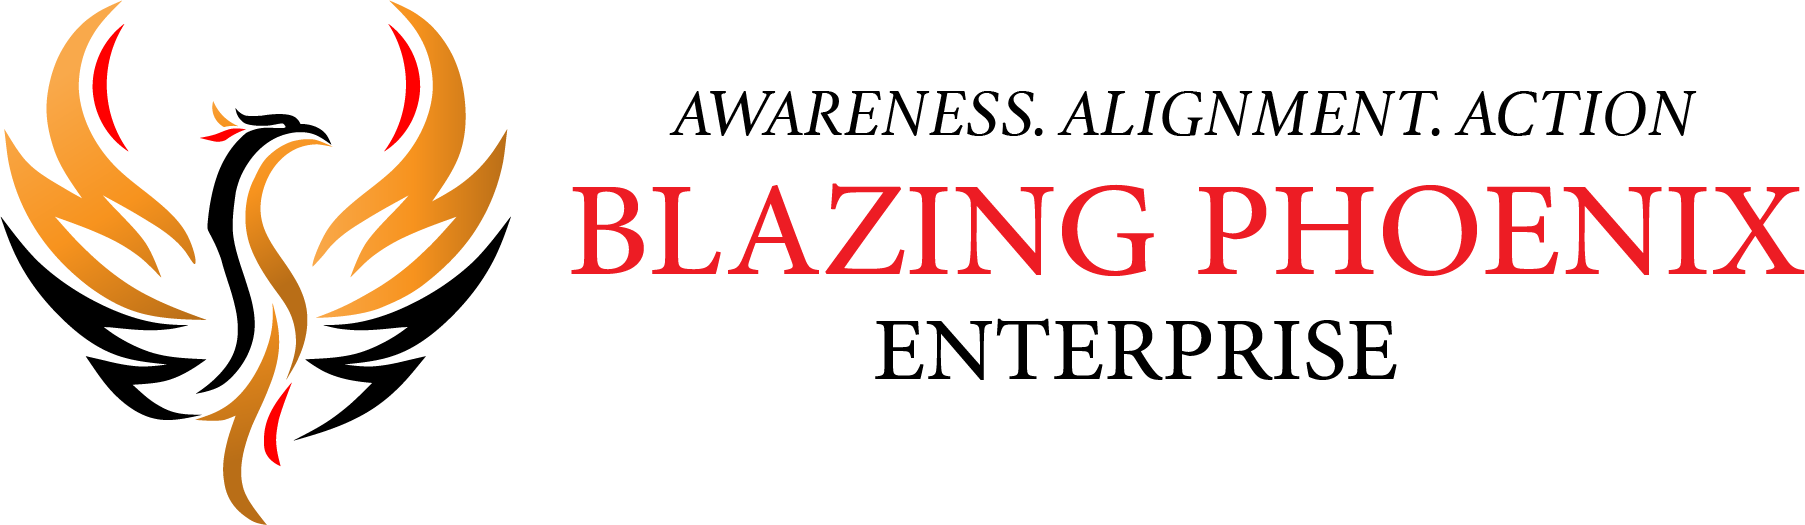 Blazing Phoenix Enterprise